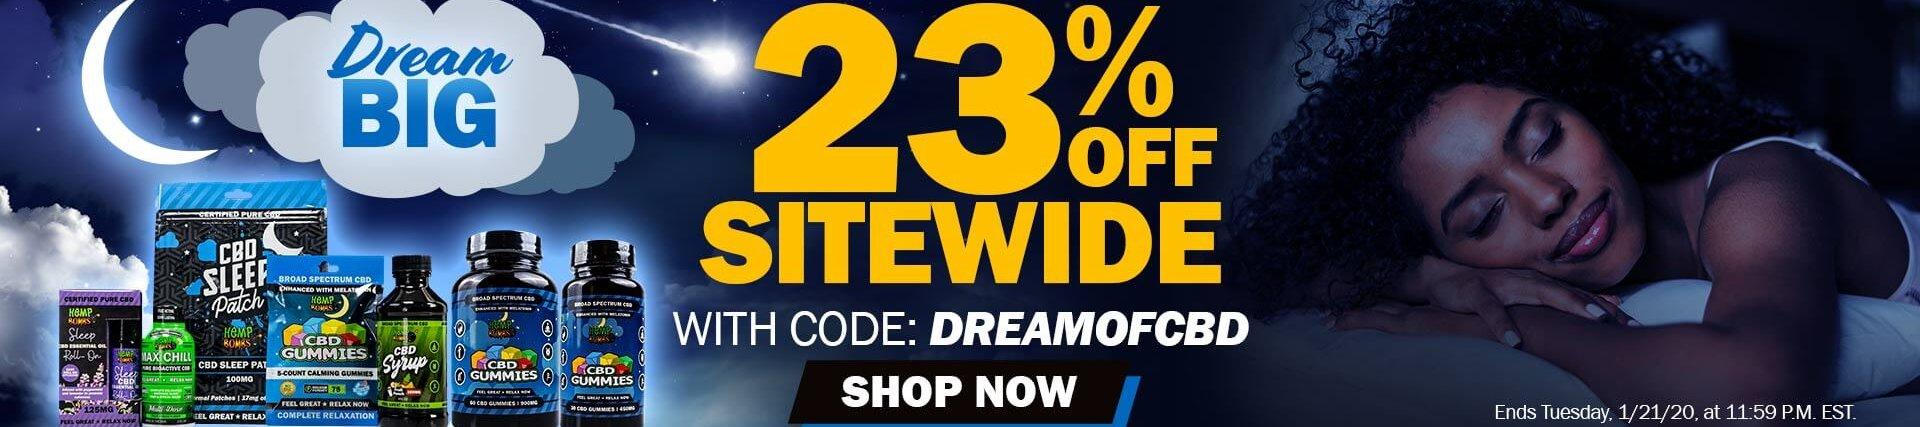 CBD Weekend Sale 23% OFF Code: DREAMOFCBD